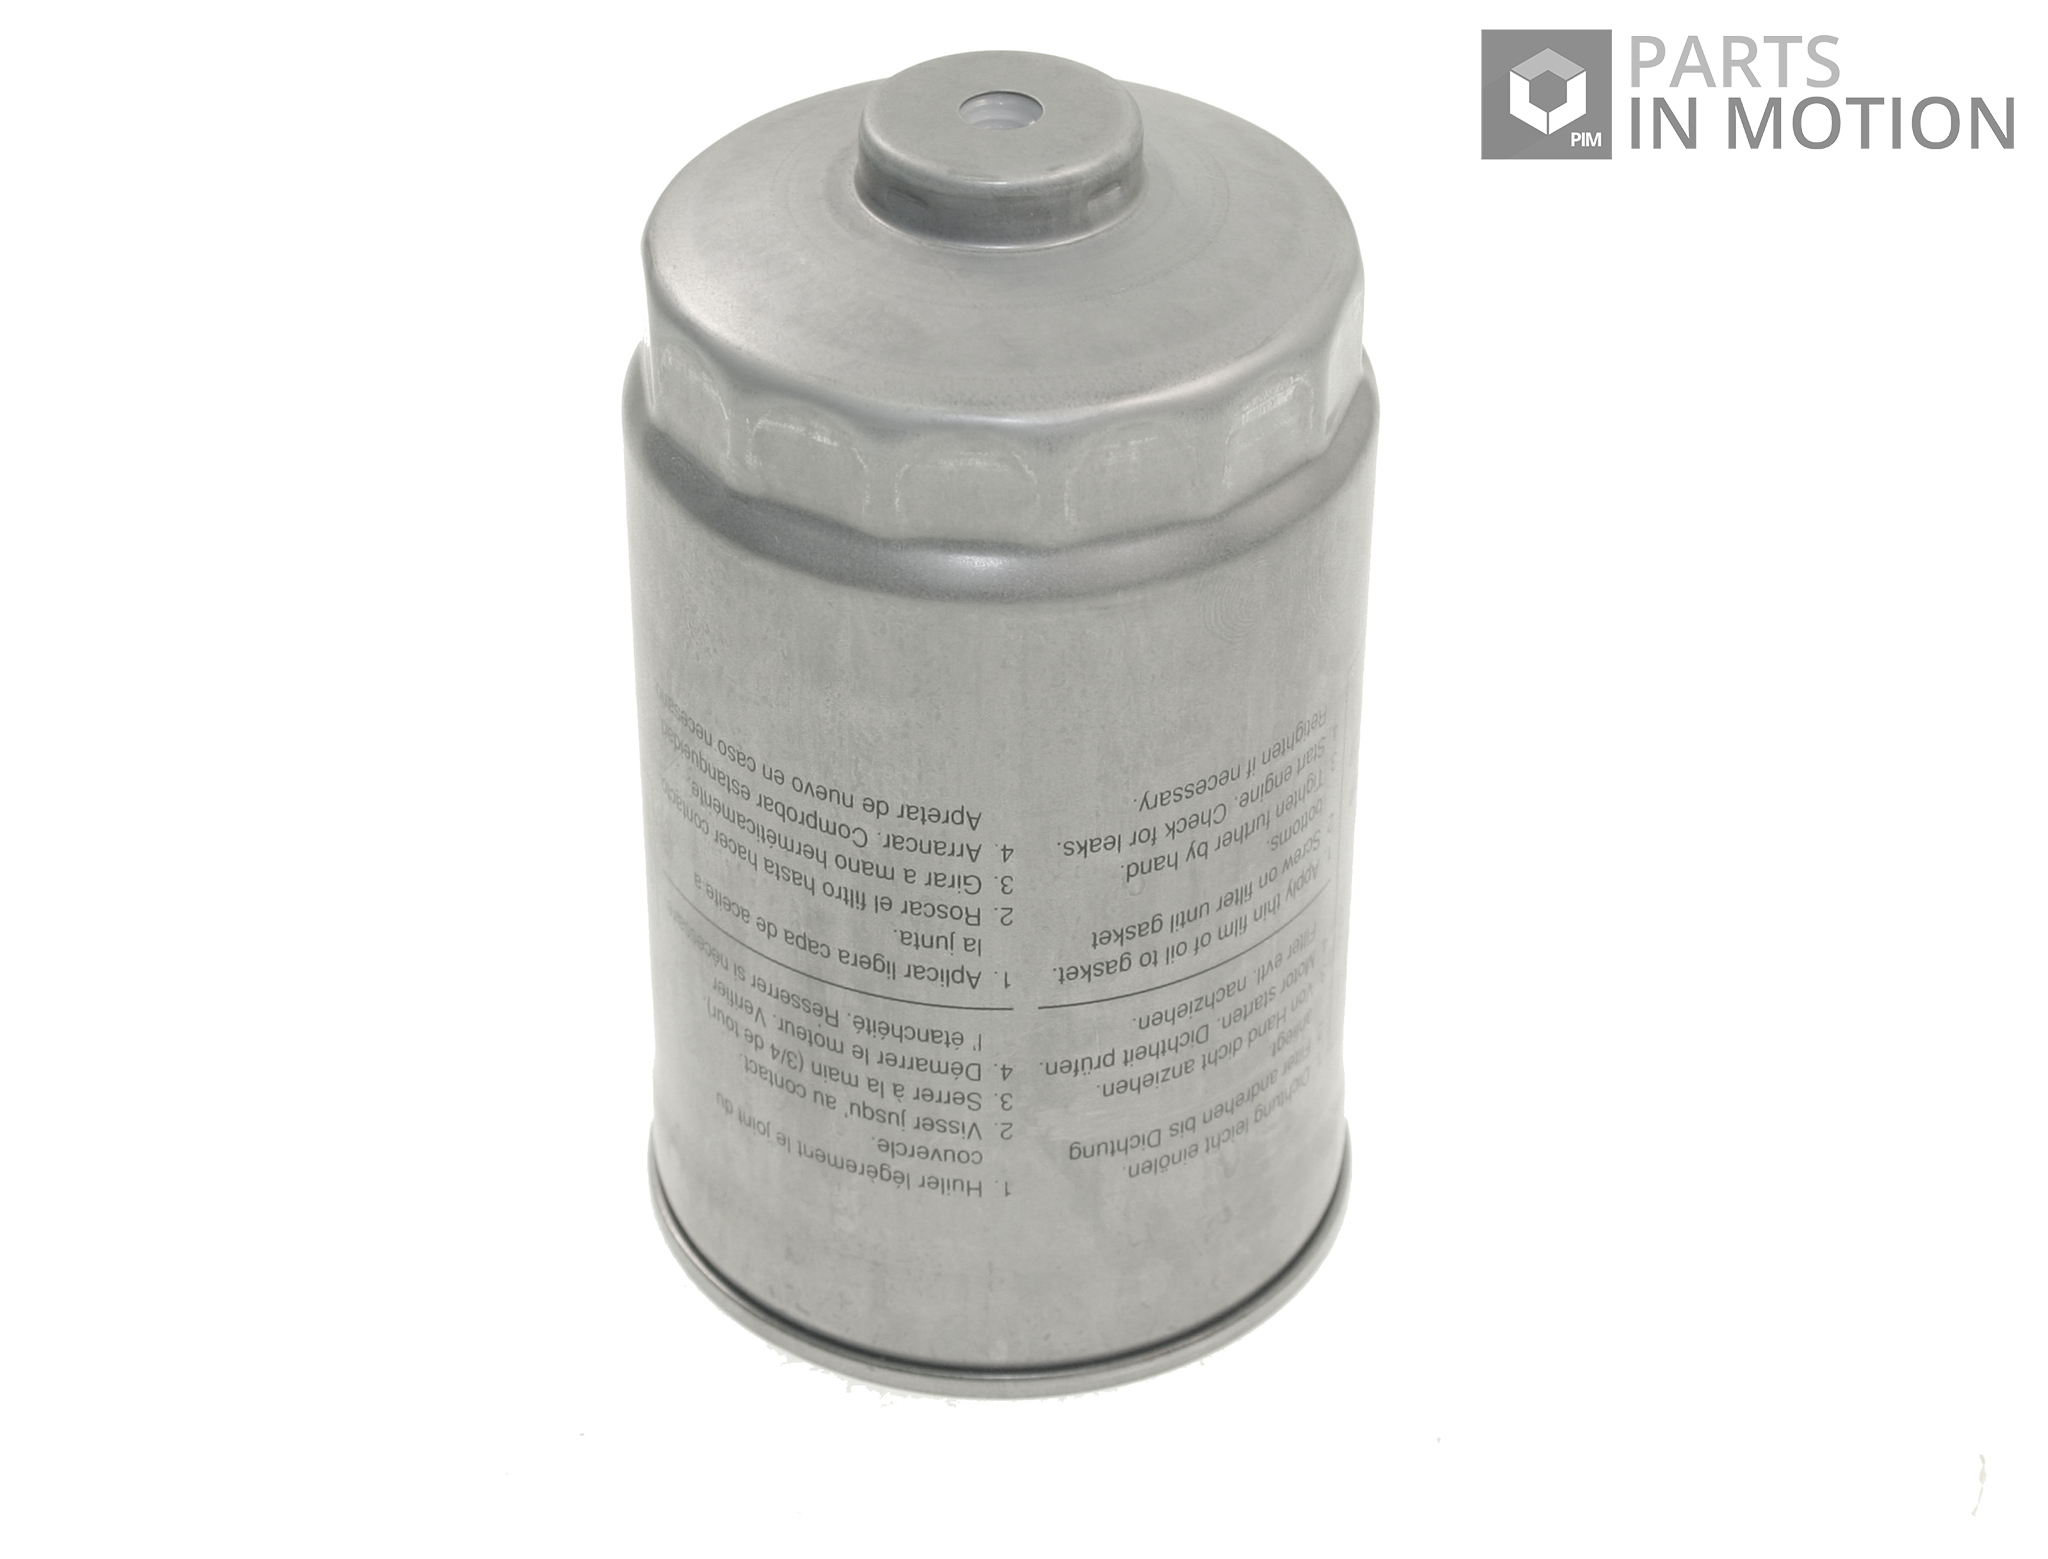 Fuel Filter Fits Kia Sorento Mk1 25d 02 To 06 D4cb Adl 3192226910 2003 Blue Print Adg02365